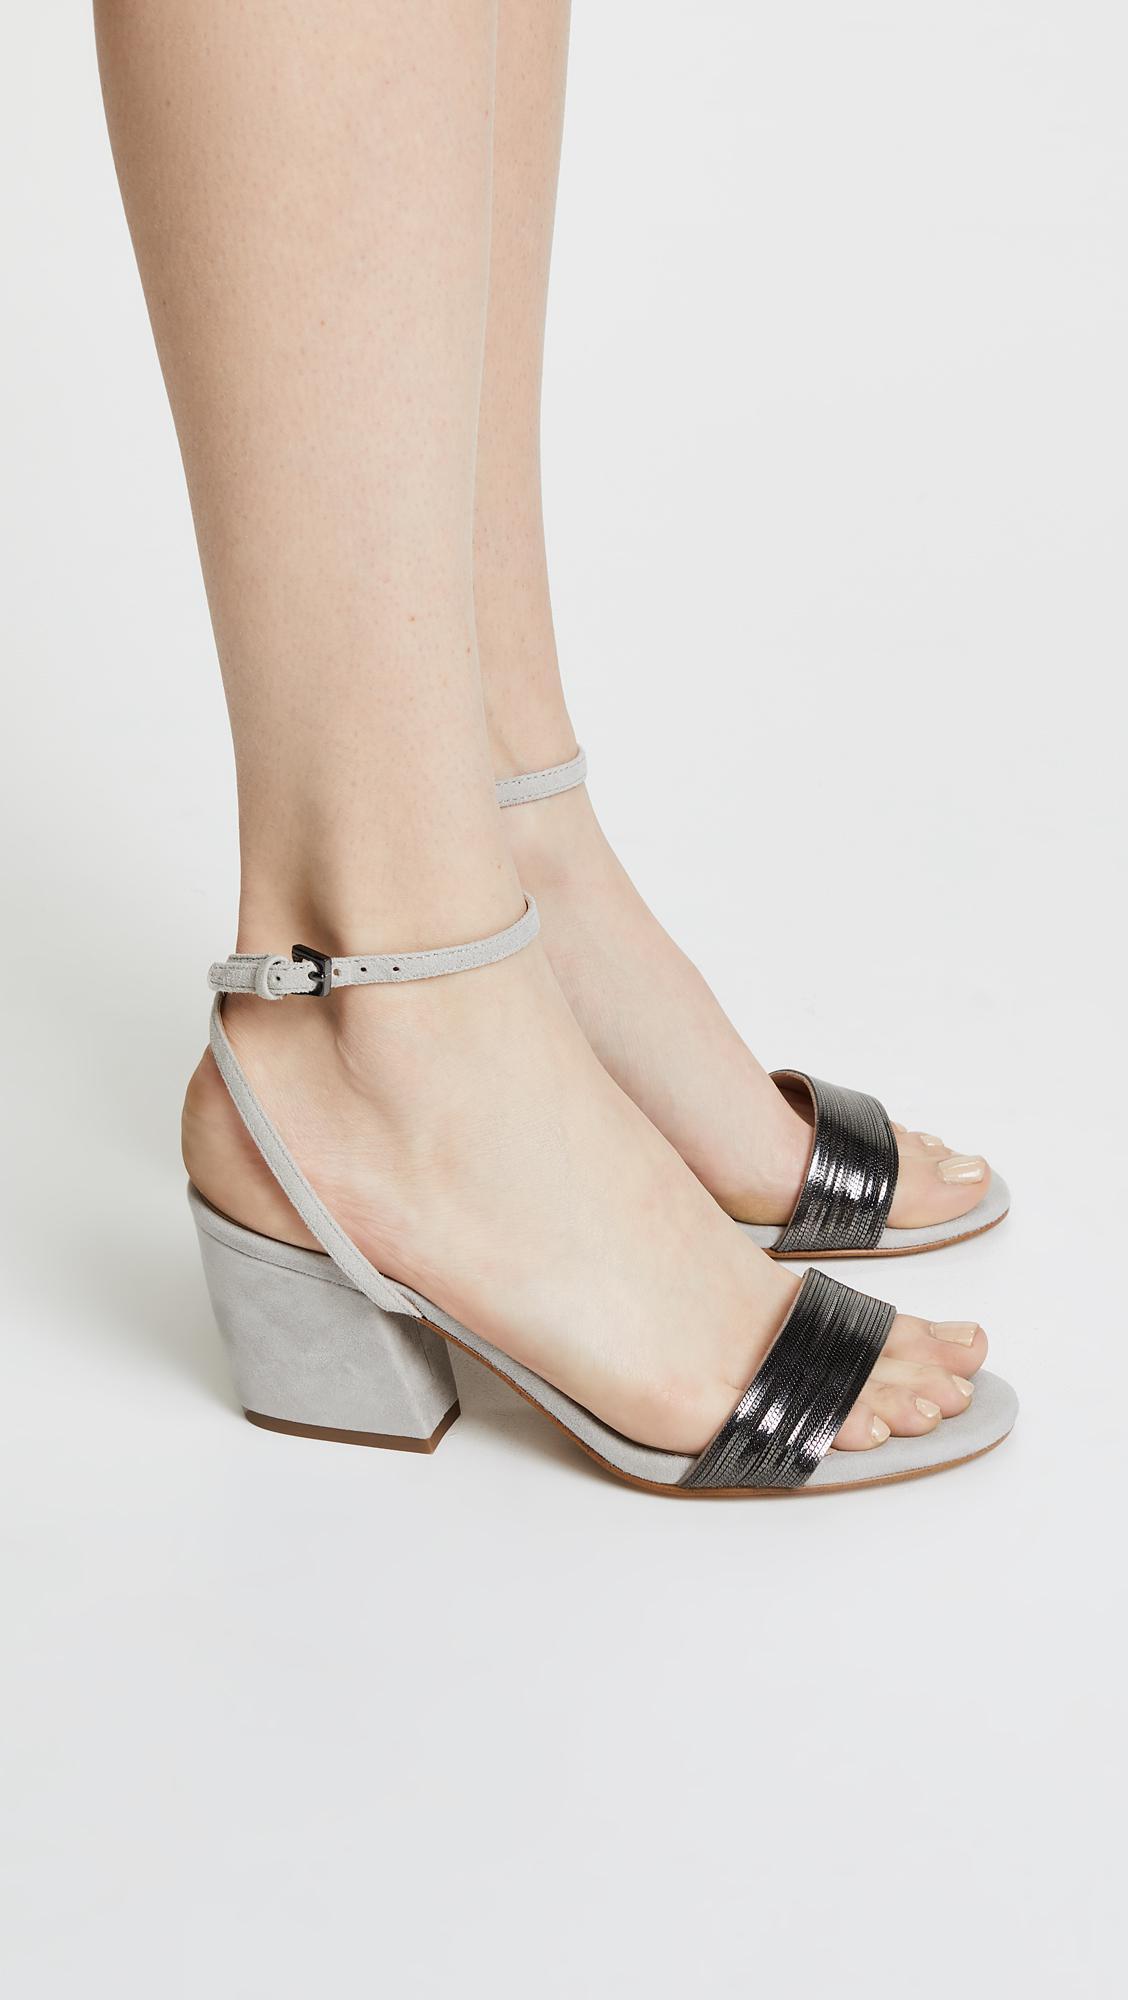 5a3097919830 Botkier Persi Block Heel Sandals - Lyst